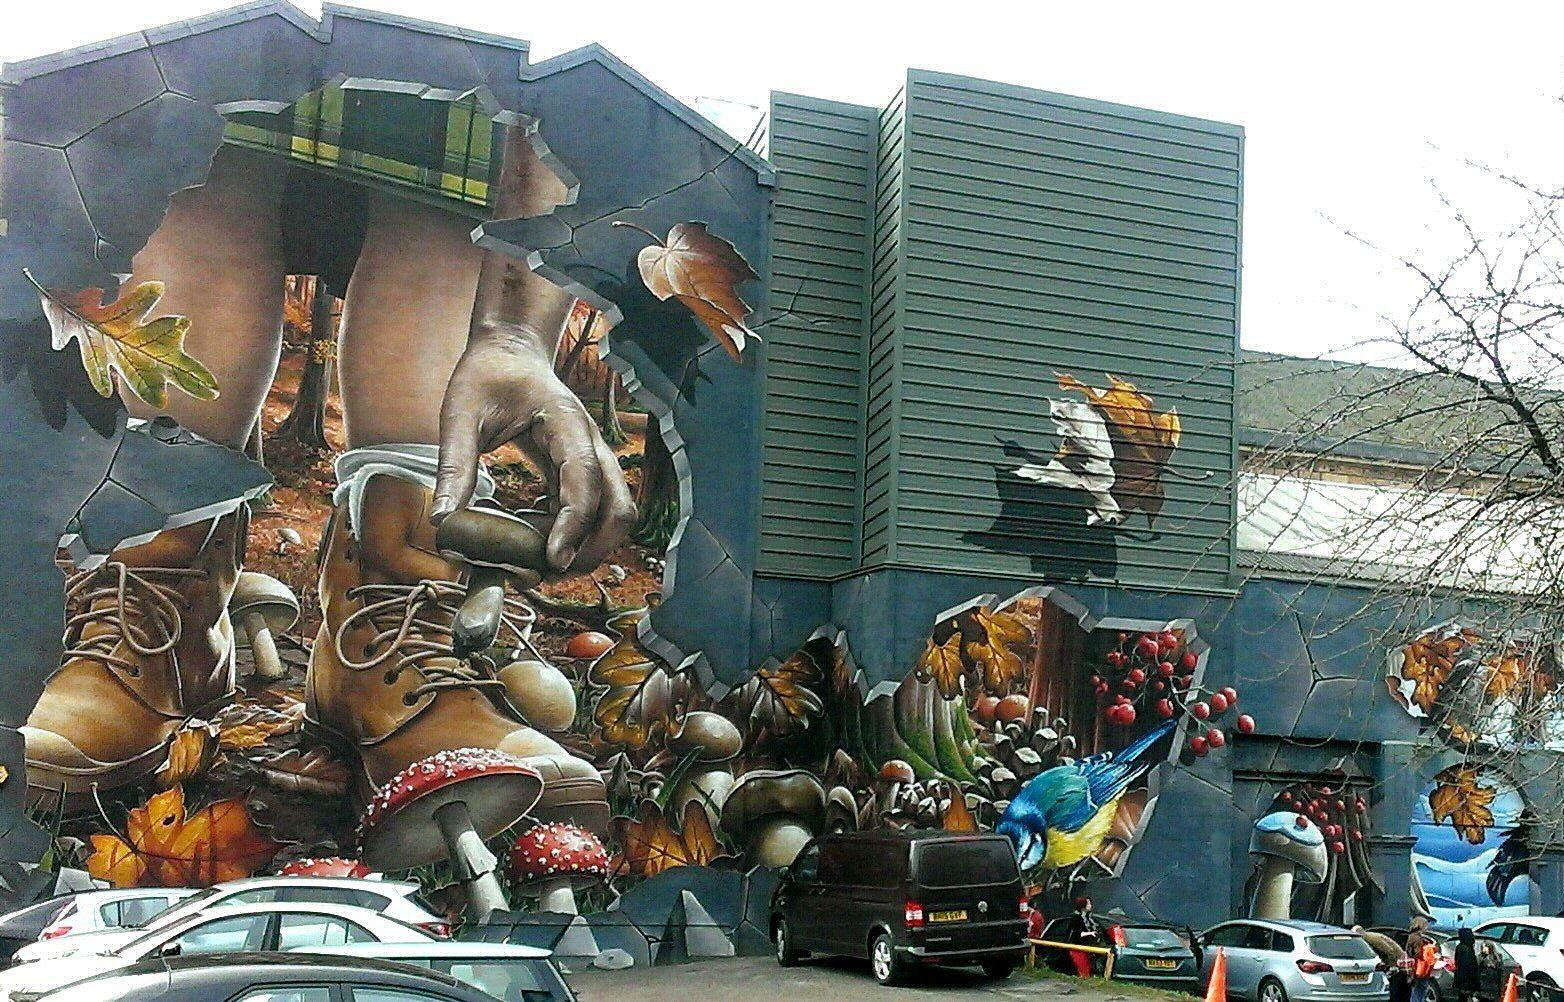 Glasgow Street Art - Ingram Street